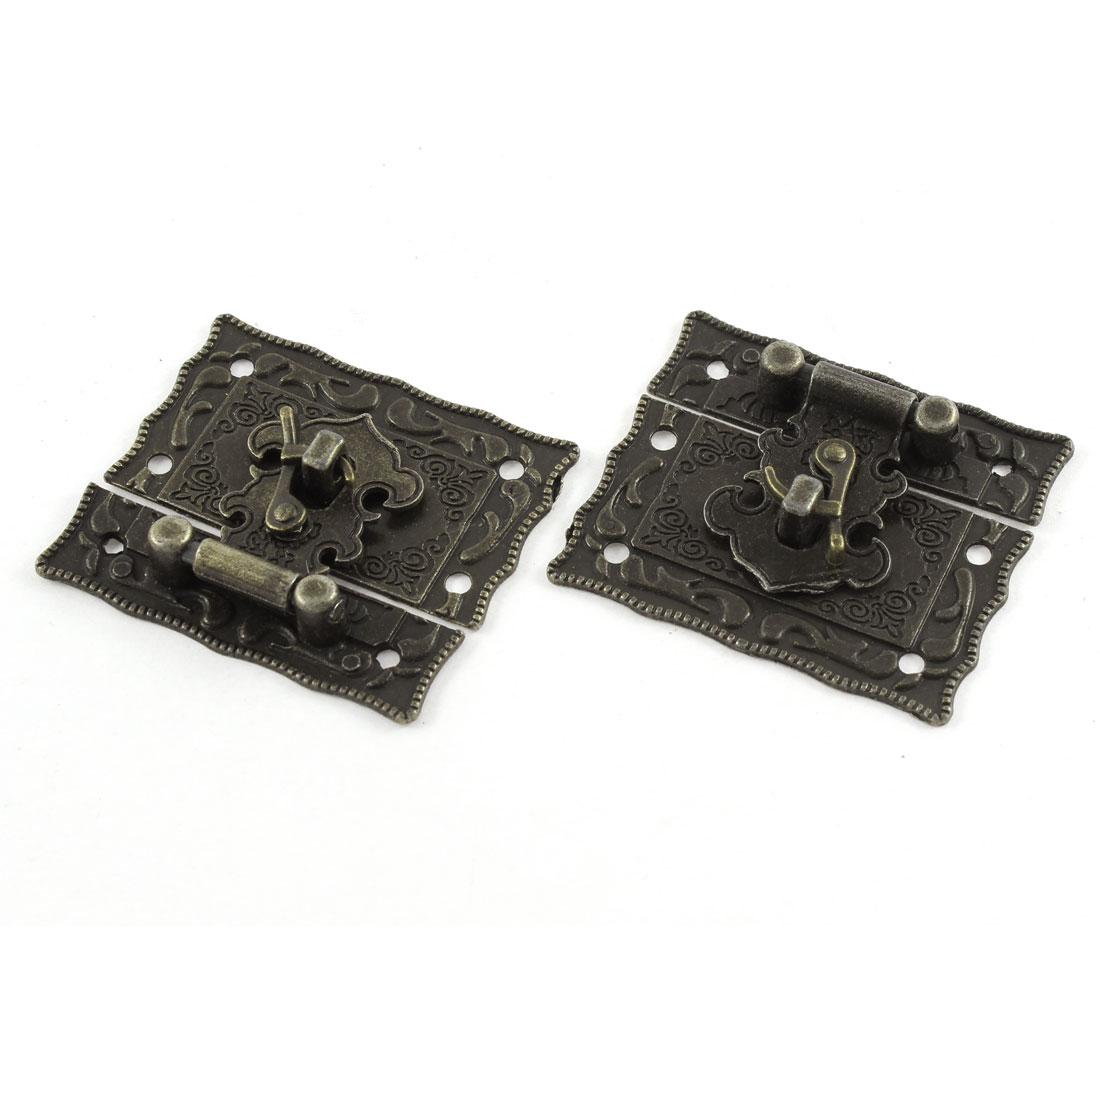 2pcs 51mmx43mm Vintage Style Jewelry Box Hasp Latch Lock w Screws